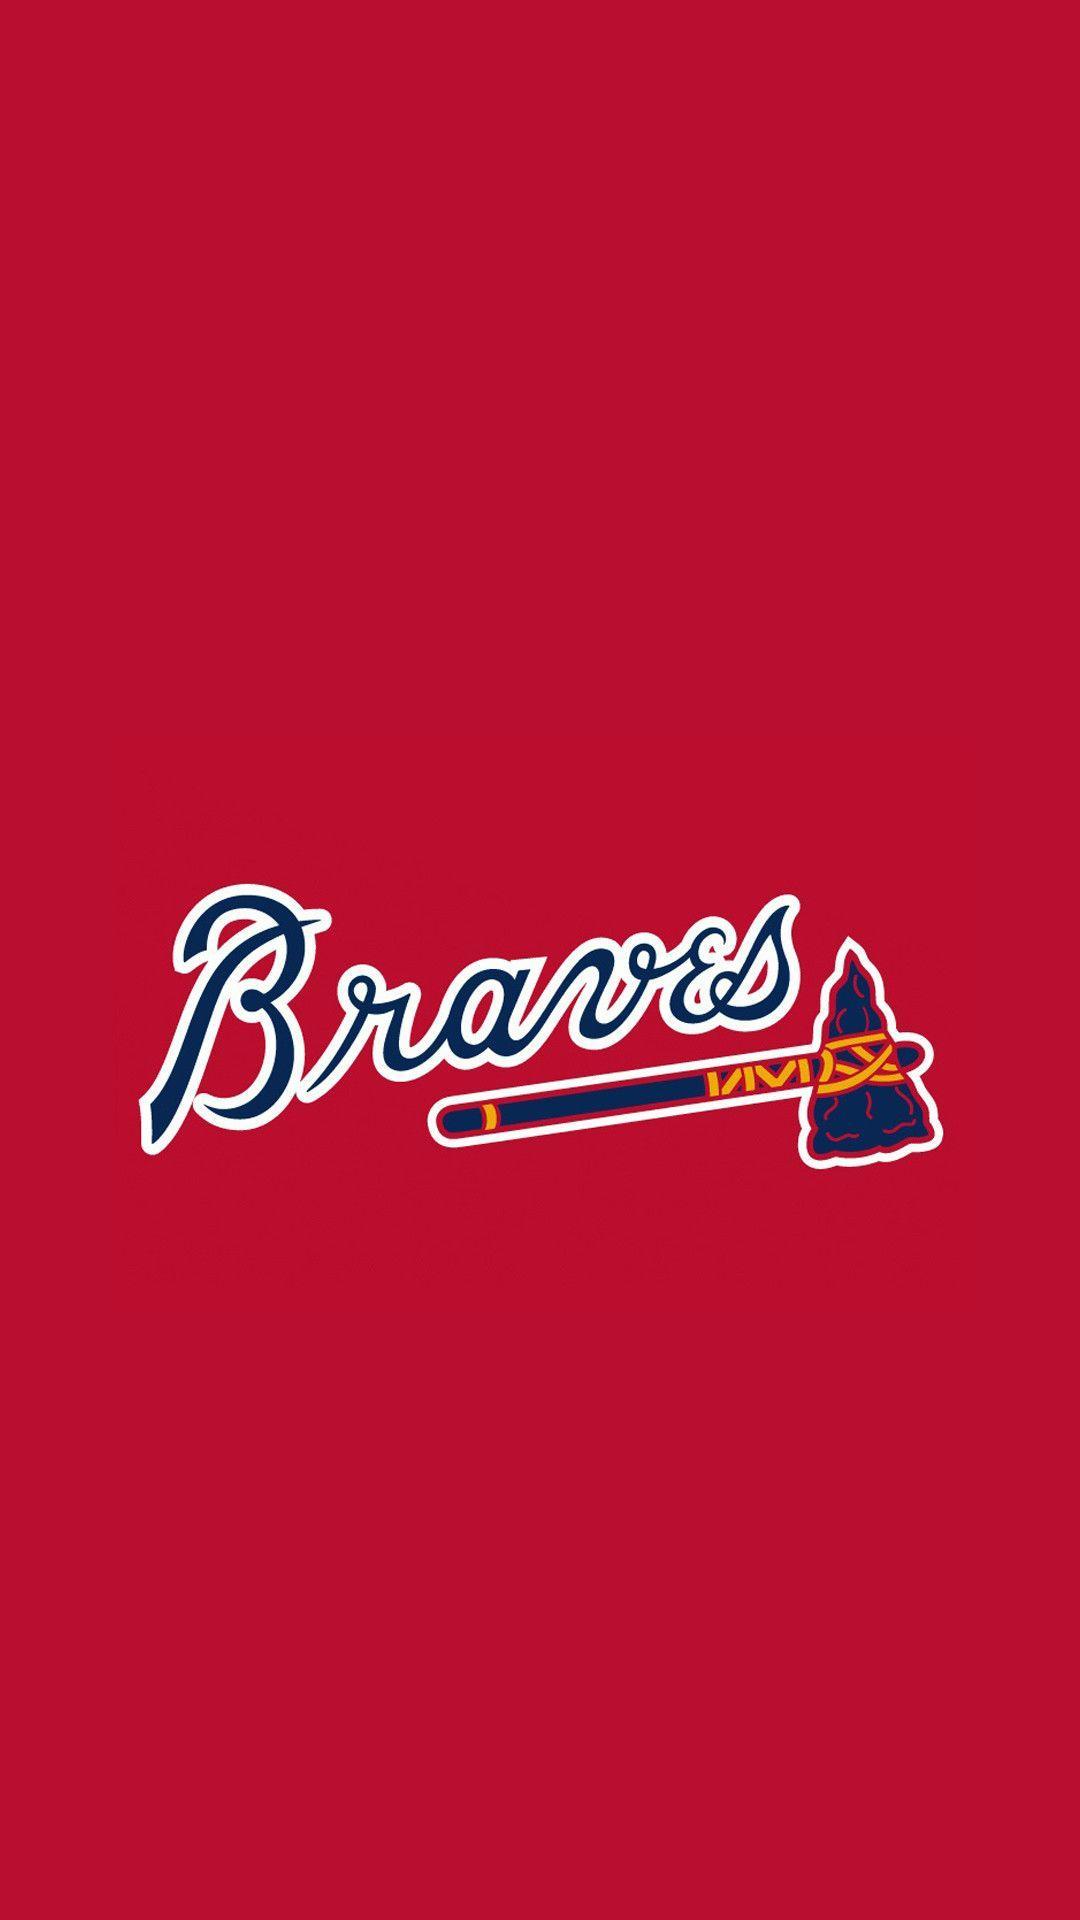 Atlanta Braves Wallpapers Top Free Atlanta Braves